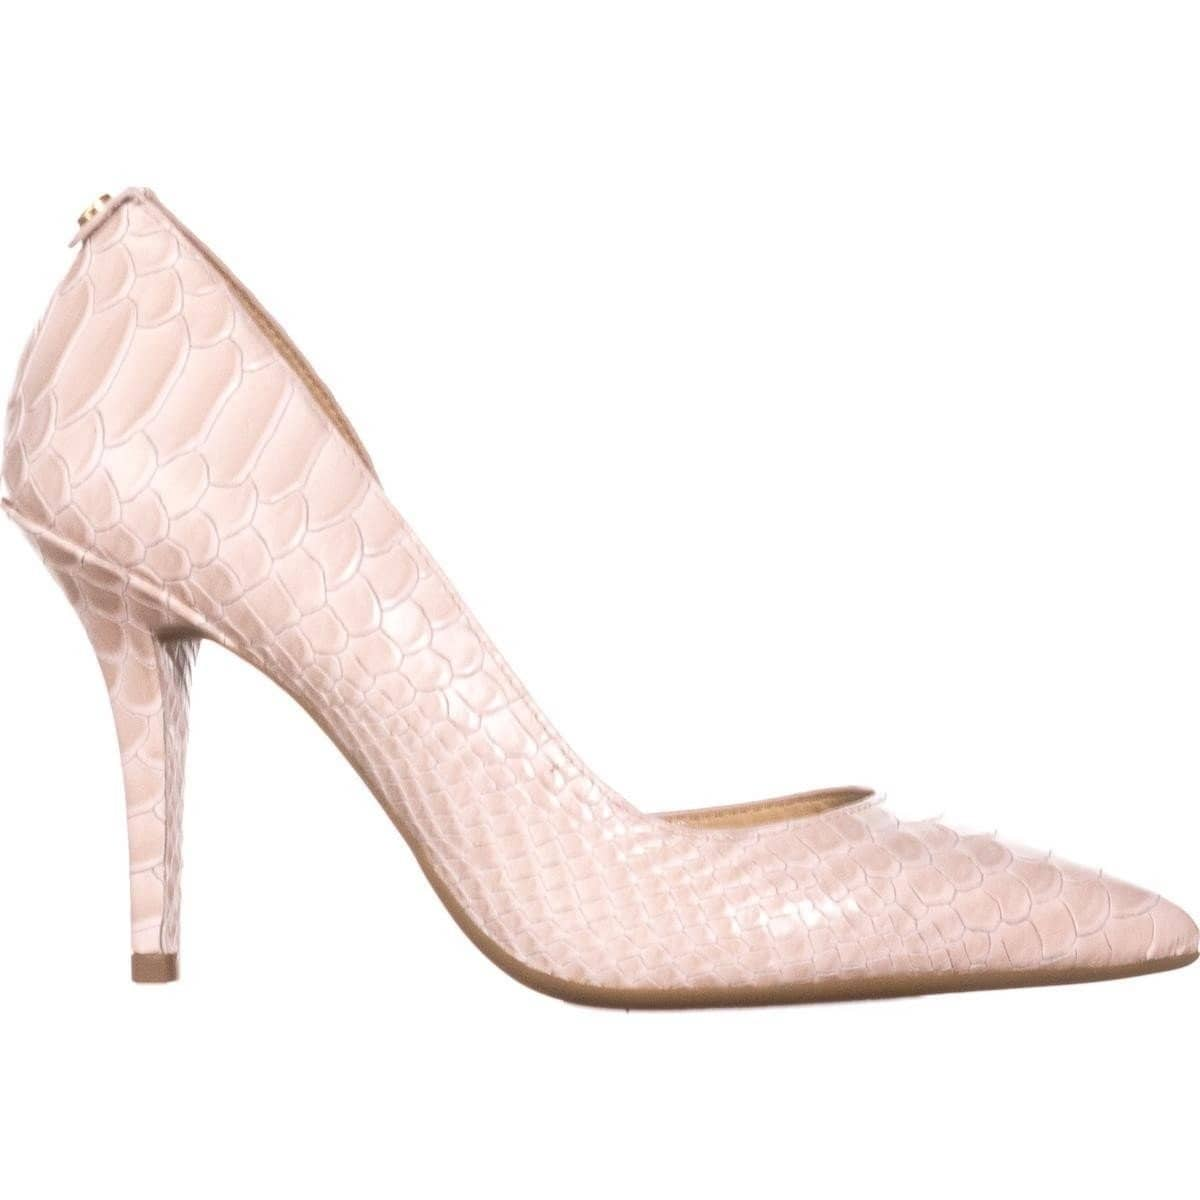 fa90aff4887e Shop MICHAEL Michael Kors Nathalie Flex High D Orsay Pumps Soft Pink ...